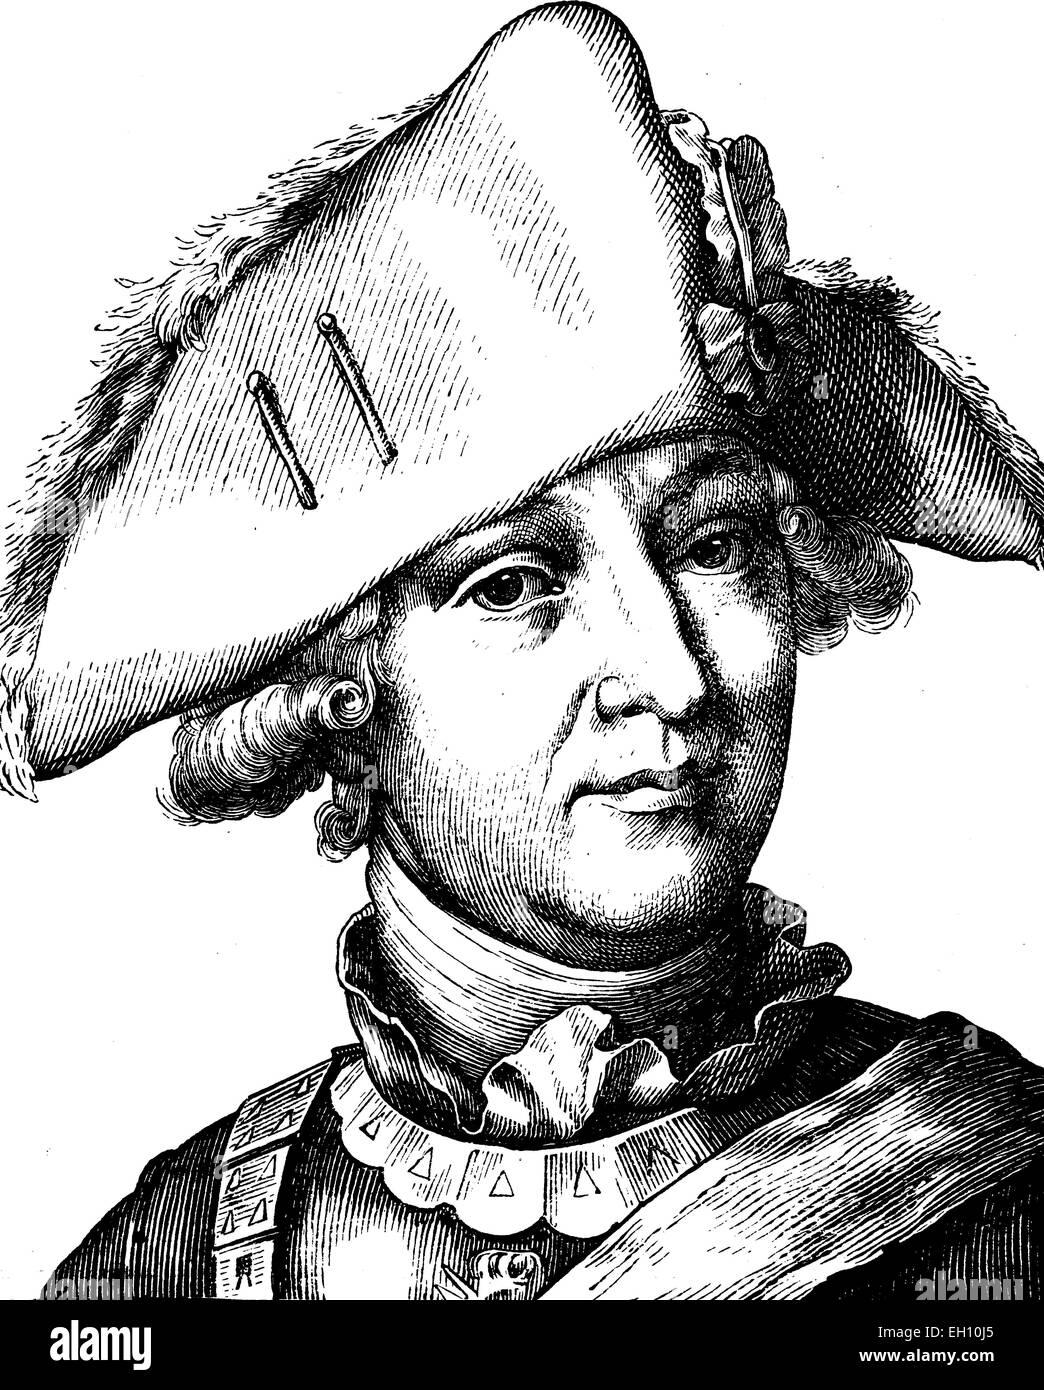 Digital improved image of Friedrich Wilhelm, Freiherr von Seydlitz, 1721 - 1773, portrait, historical illustration, Stock Photo